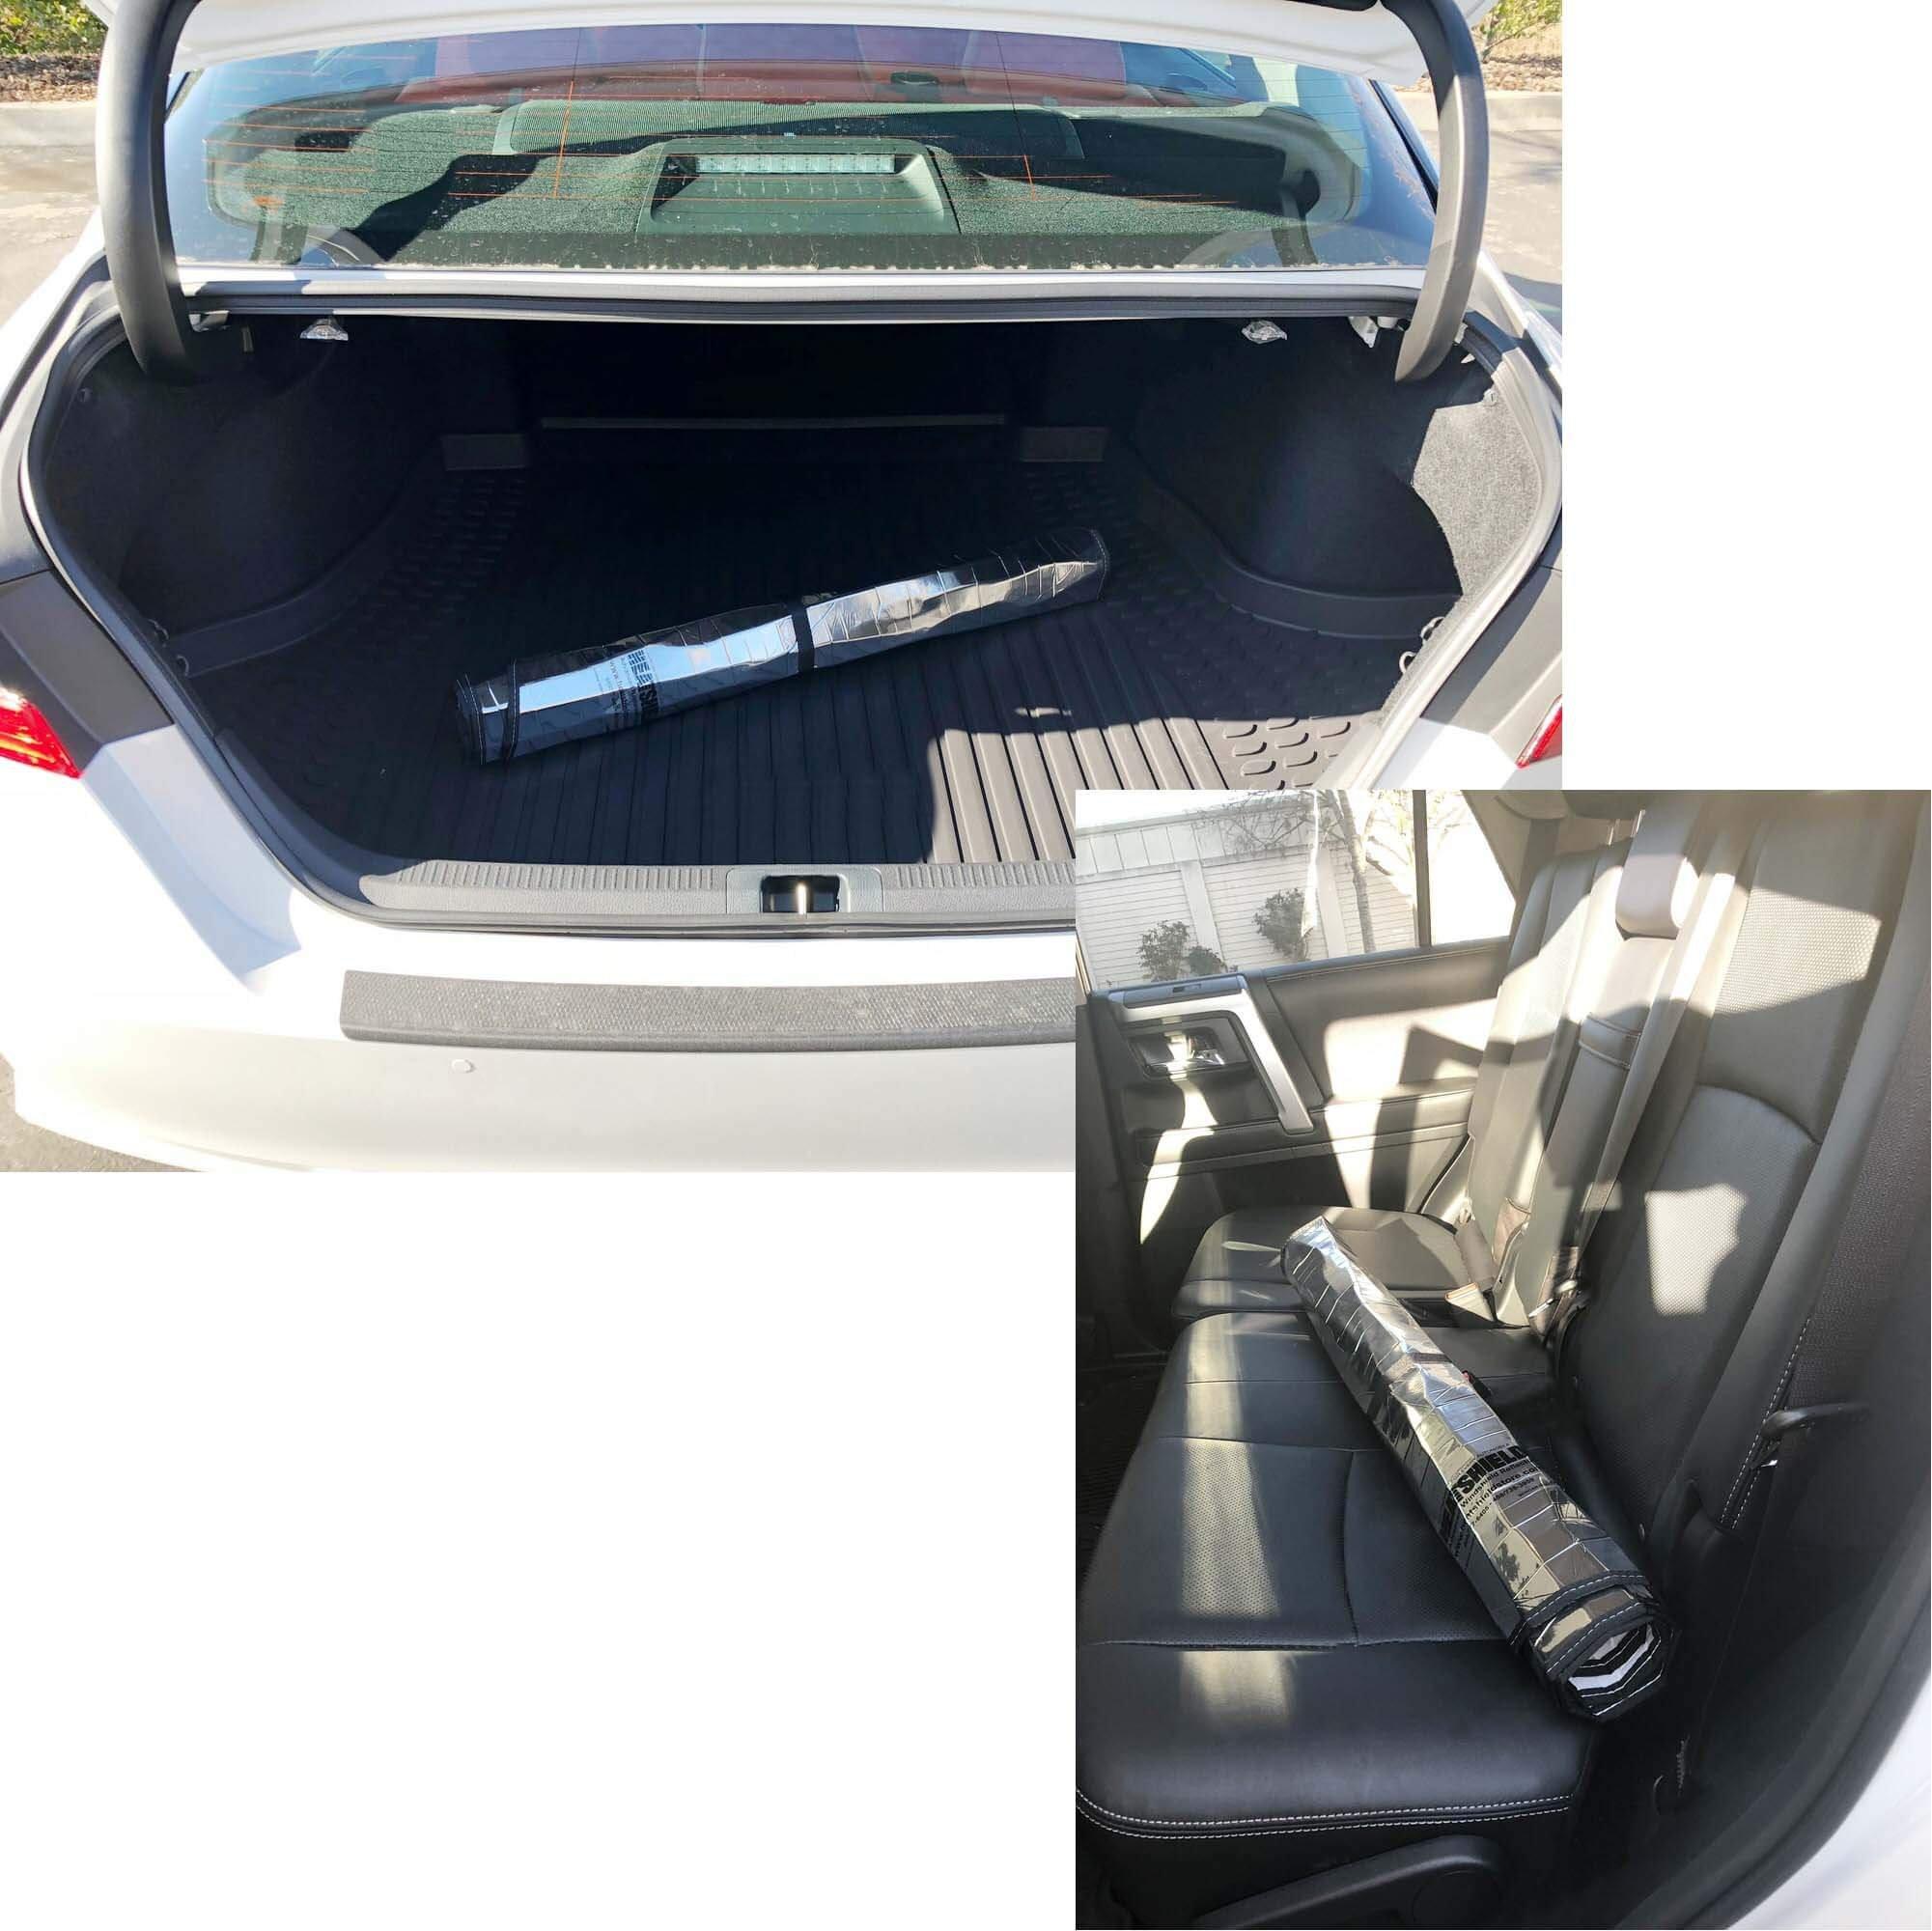 HeatShield The Original Auto Sunshade, Custom-Fit for Honda Civic Sedan 2012, 2013, 2014, 2015, Silver Series by HeatShield (Image #4)